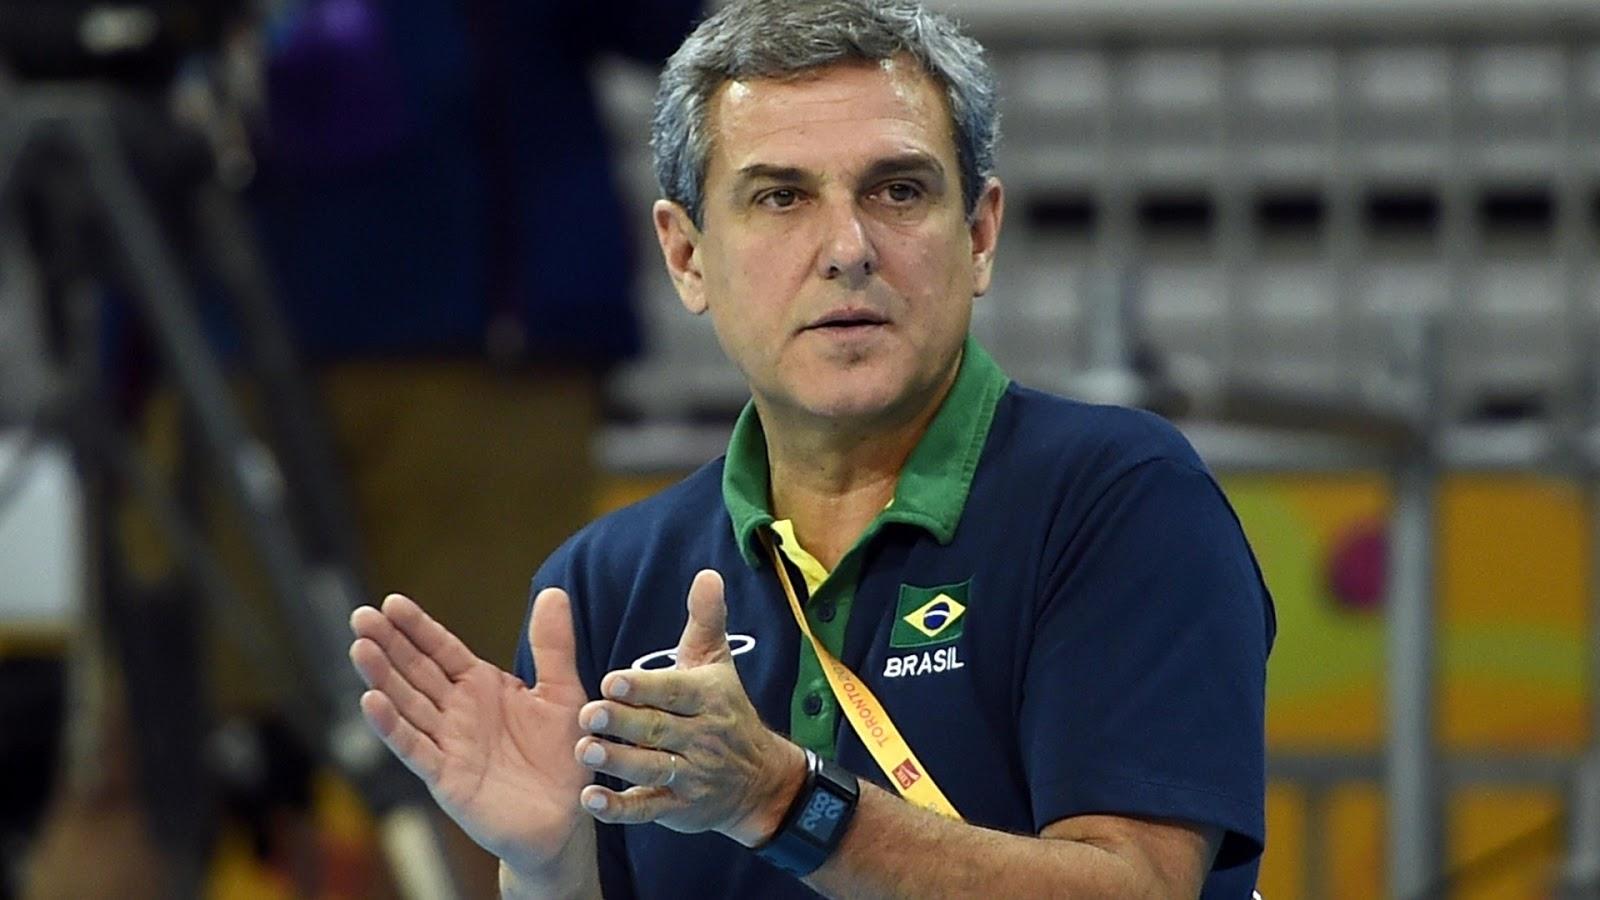 Brazil Women's Volleyball Team Coach - Jose Roberto Guimaraes